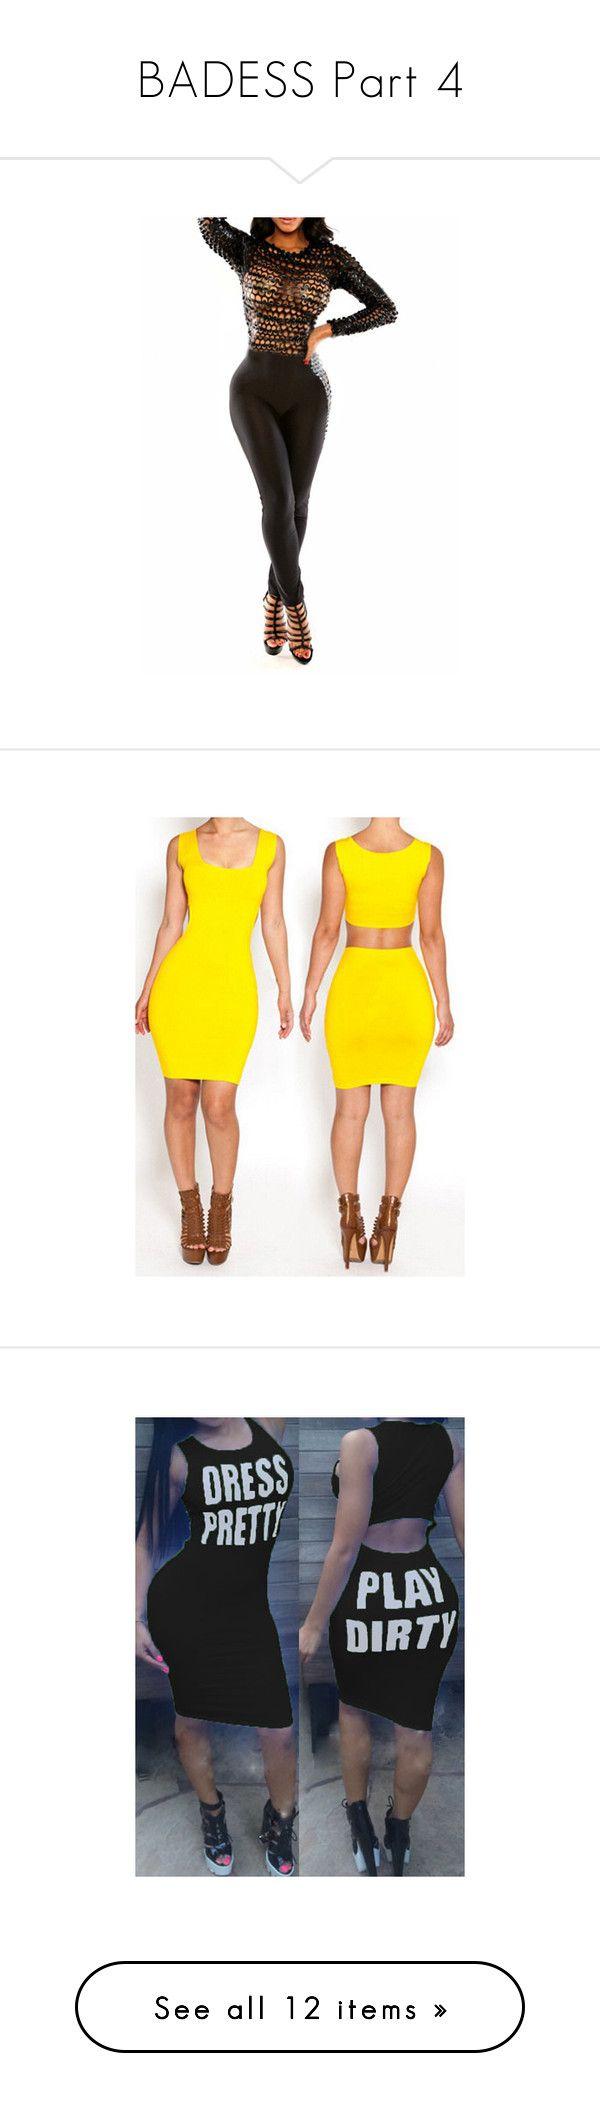 """BADESS Part 4"" by blacke-nyla-alsina ❤ liked on Polyvore featuring jumpsuits, black, skinny jumpsuit, long sleeve jump suit, skinny leg jumpsuit, spandex jumpsuit, jump suit, dresses, yellow and yellow mini dress"